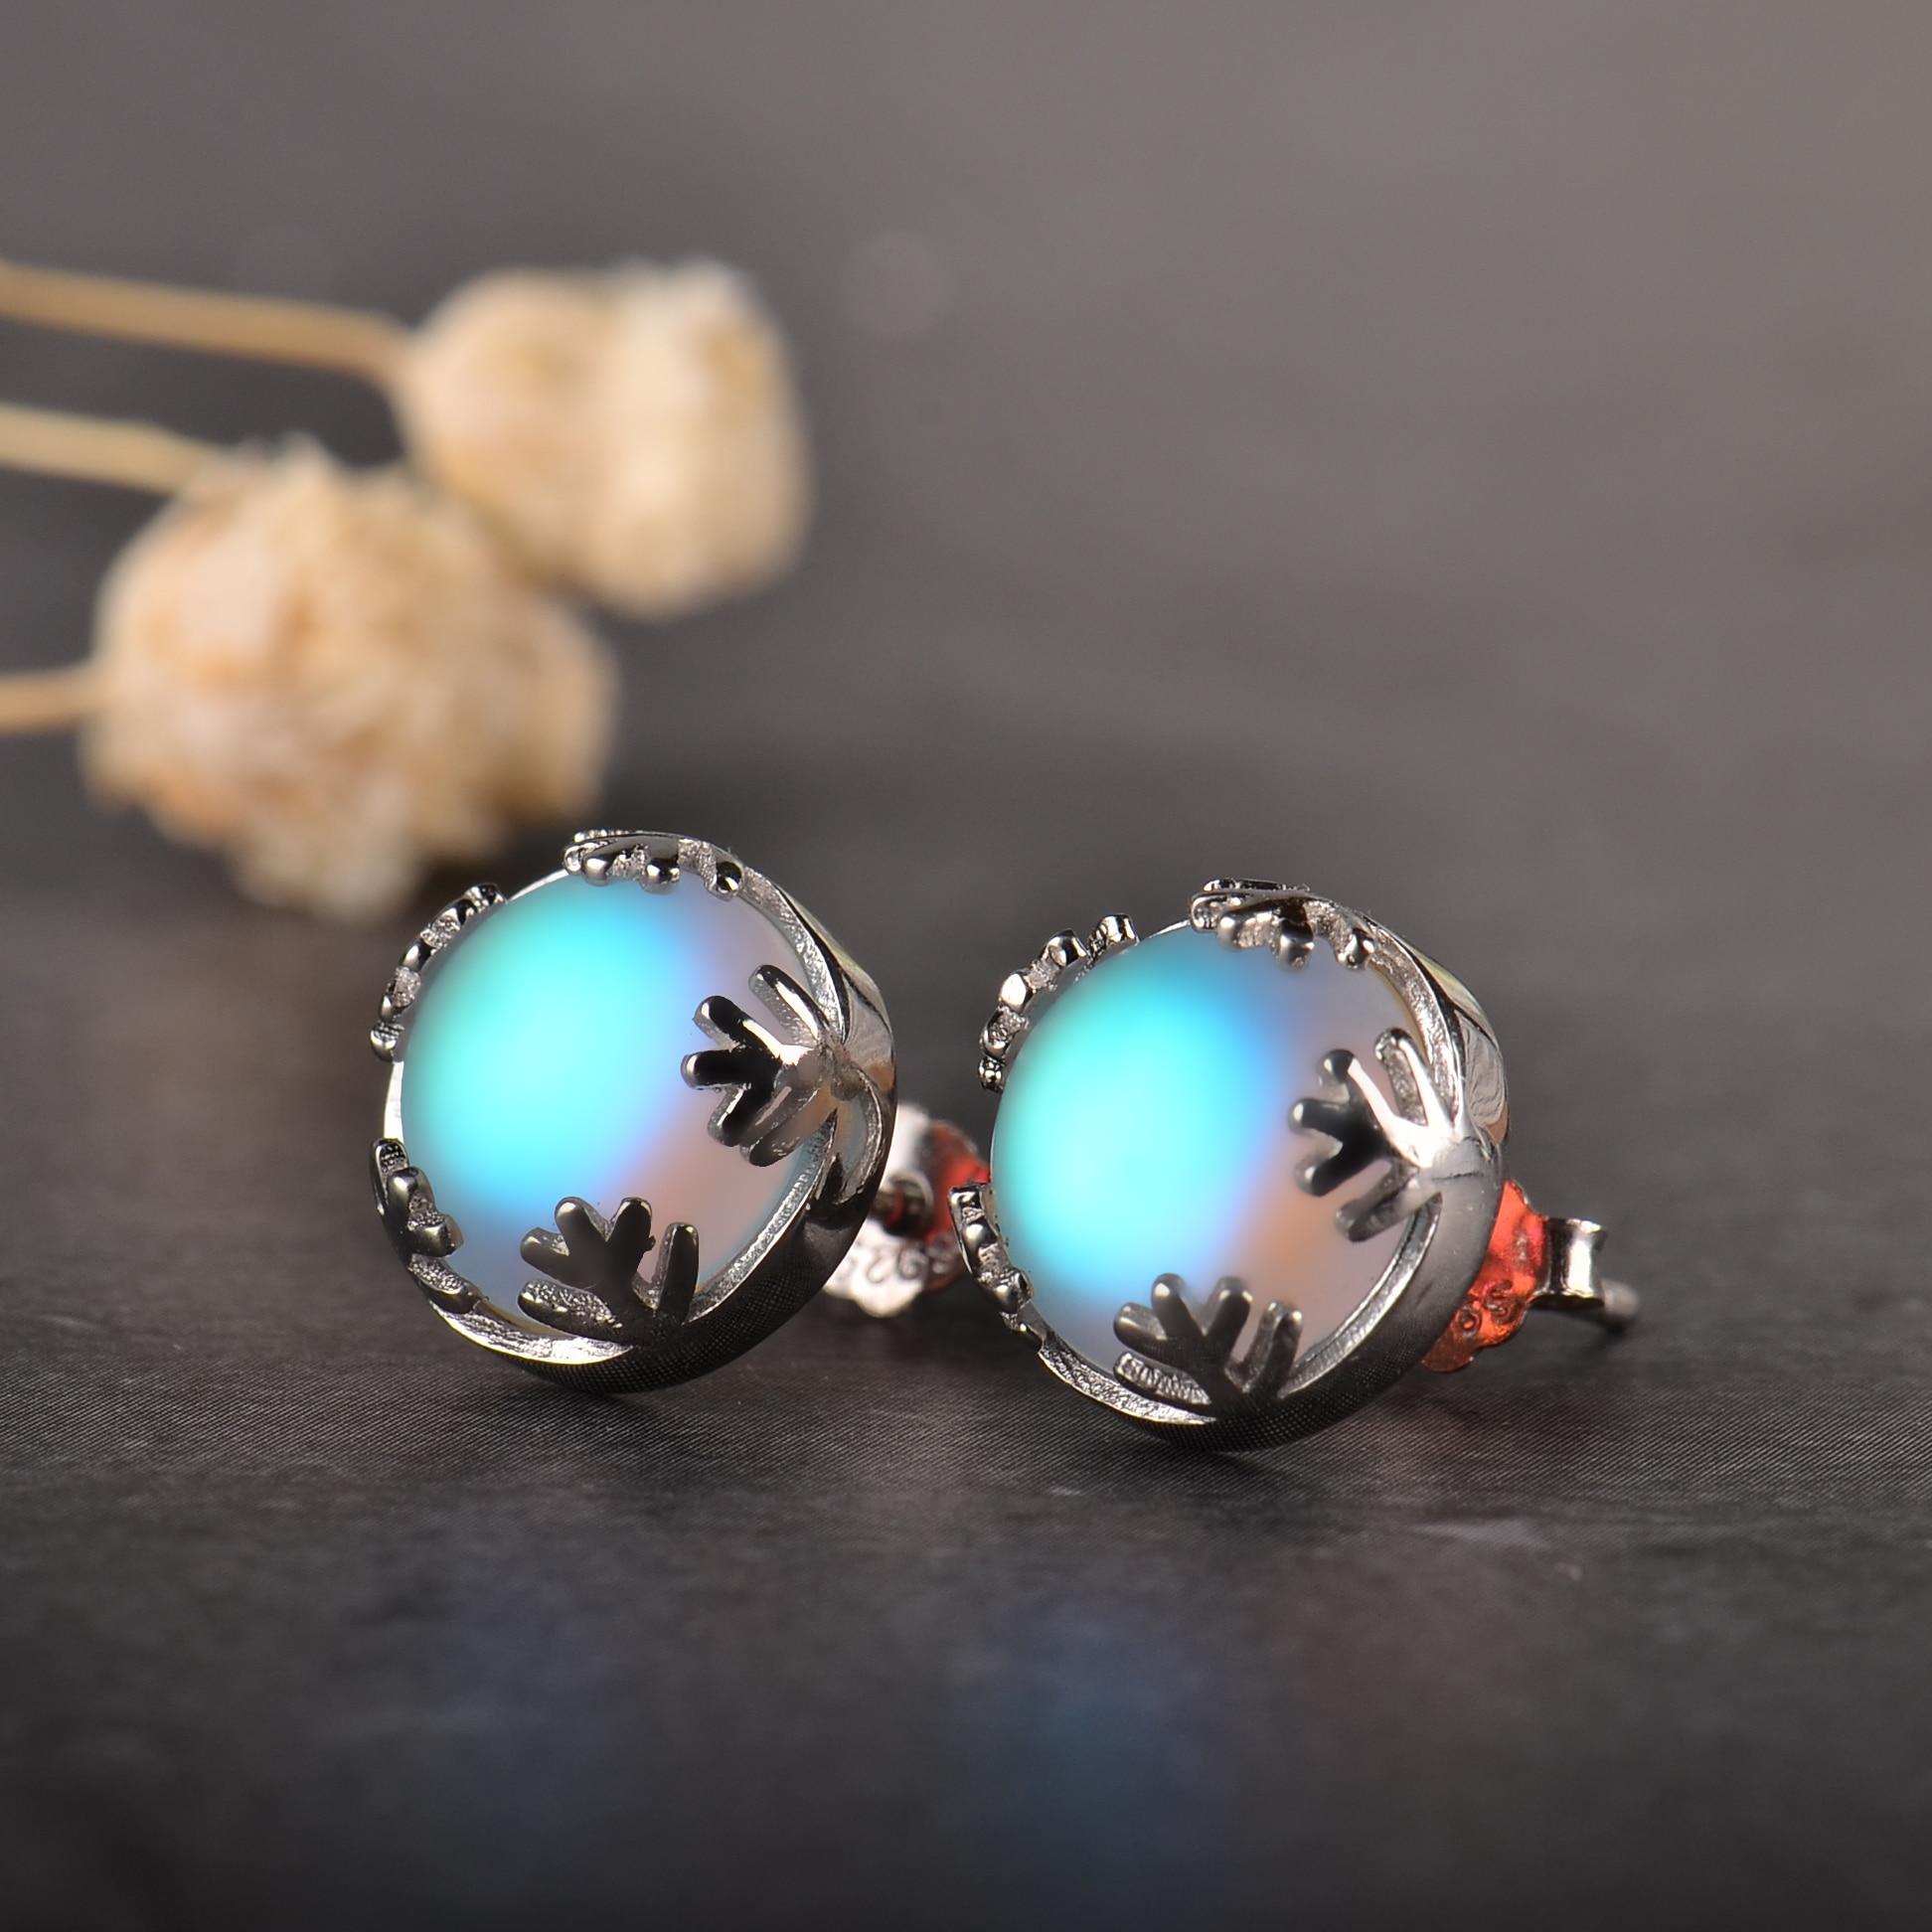 Moonlight Ladies Fashion Aurora Borealis Earrings s925 Silver Stud Elegant Jewelry Birthdays Romatic Gift for Women 2